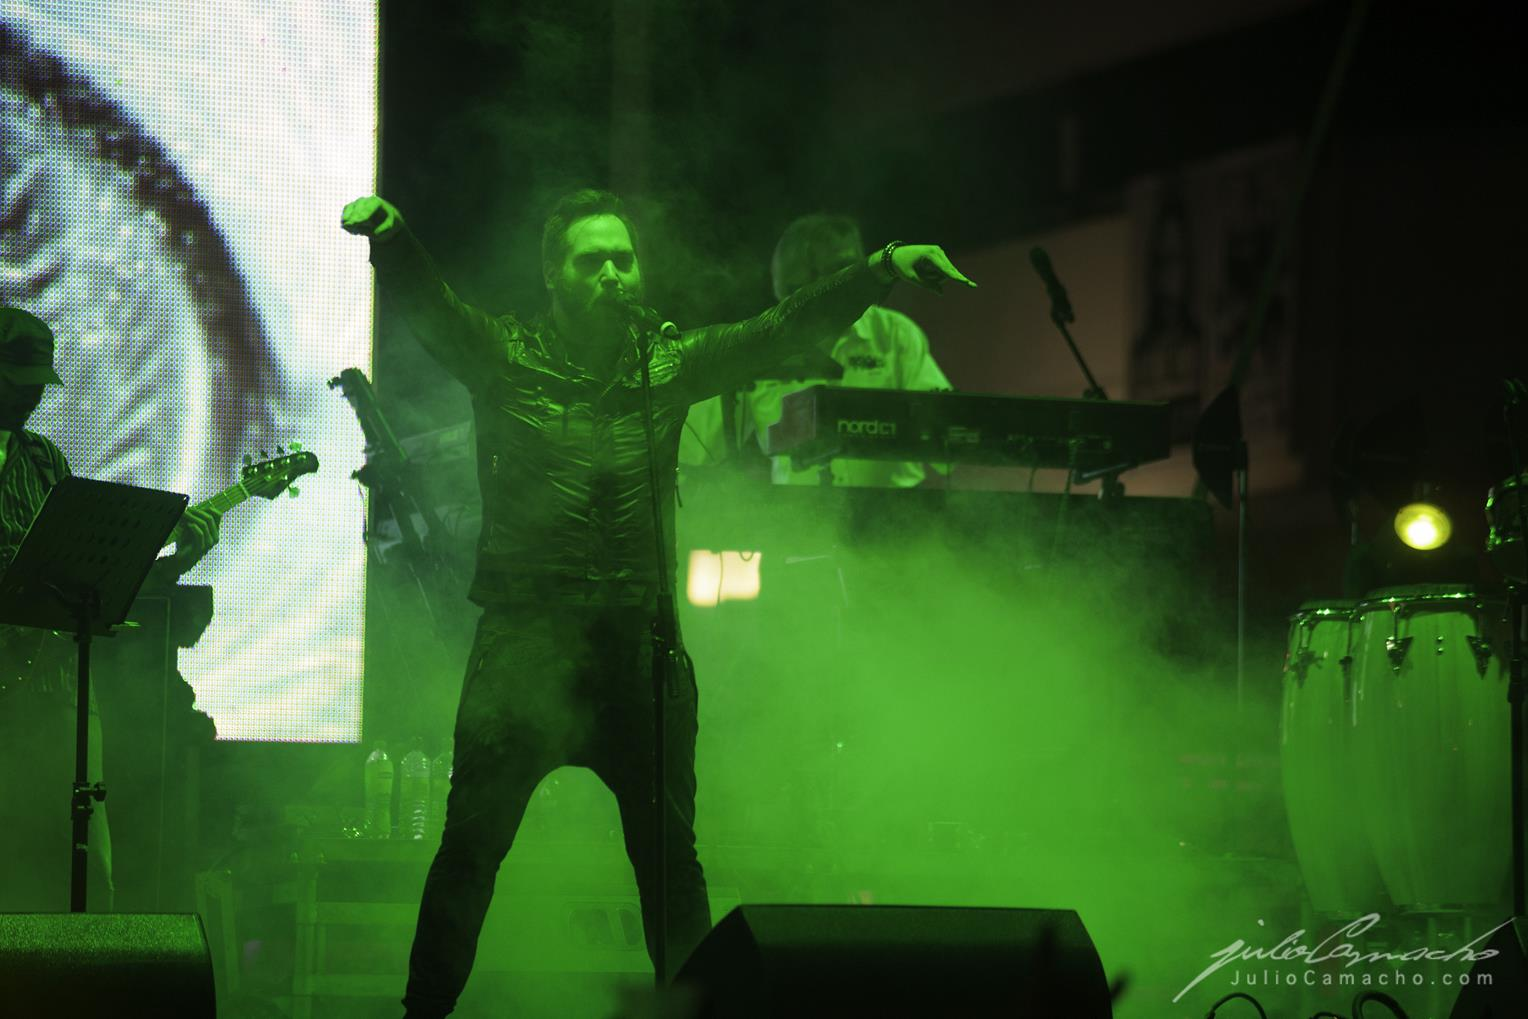 2014-10-30 31 CAST TOUR Ensenada y Tijuana - 1417 - www.Juli (Copy).jpg